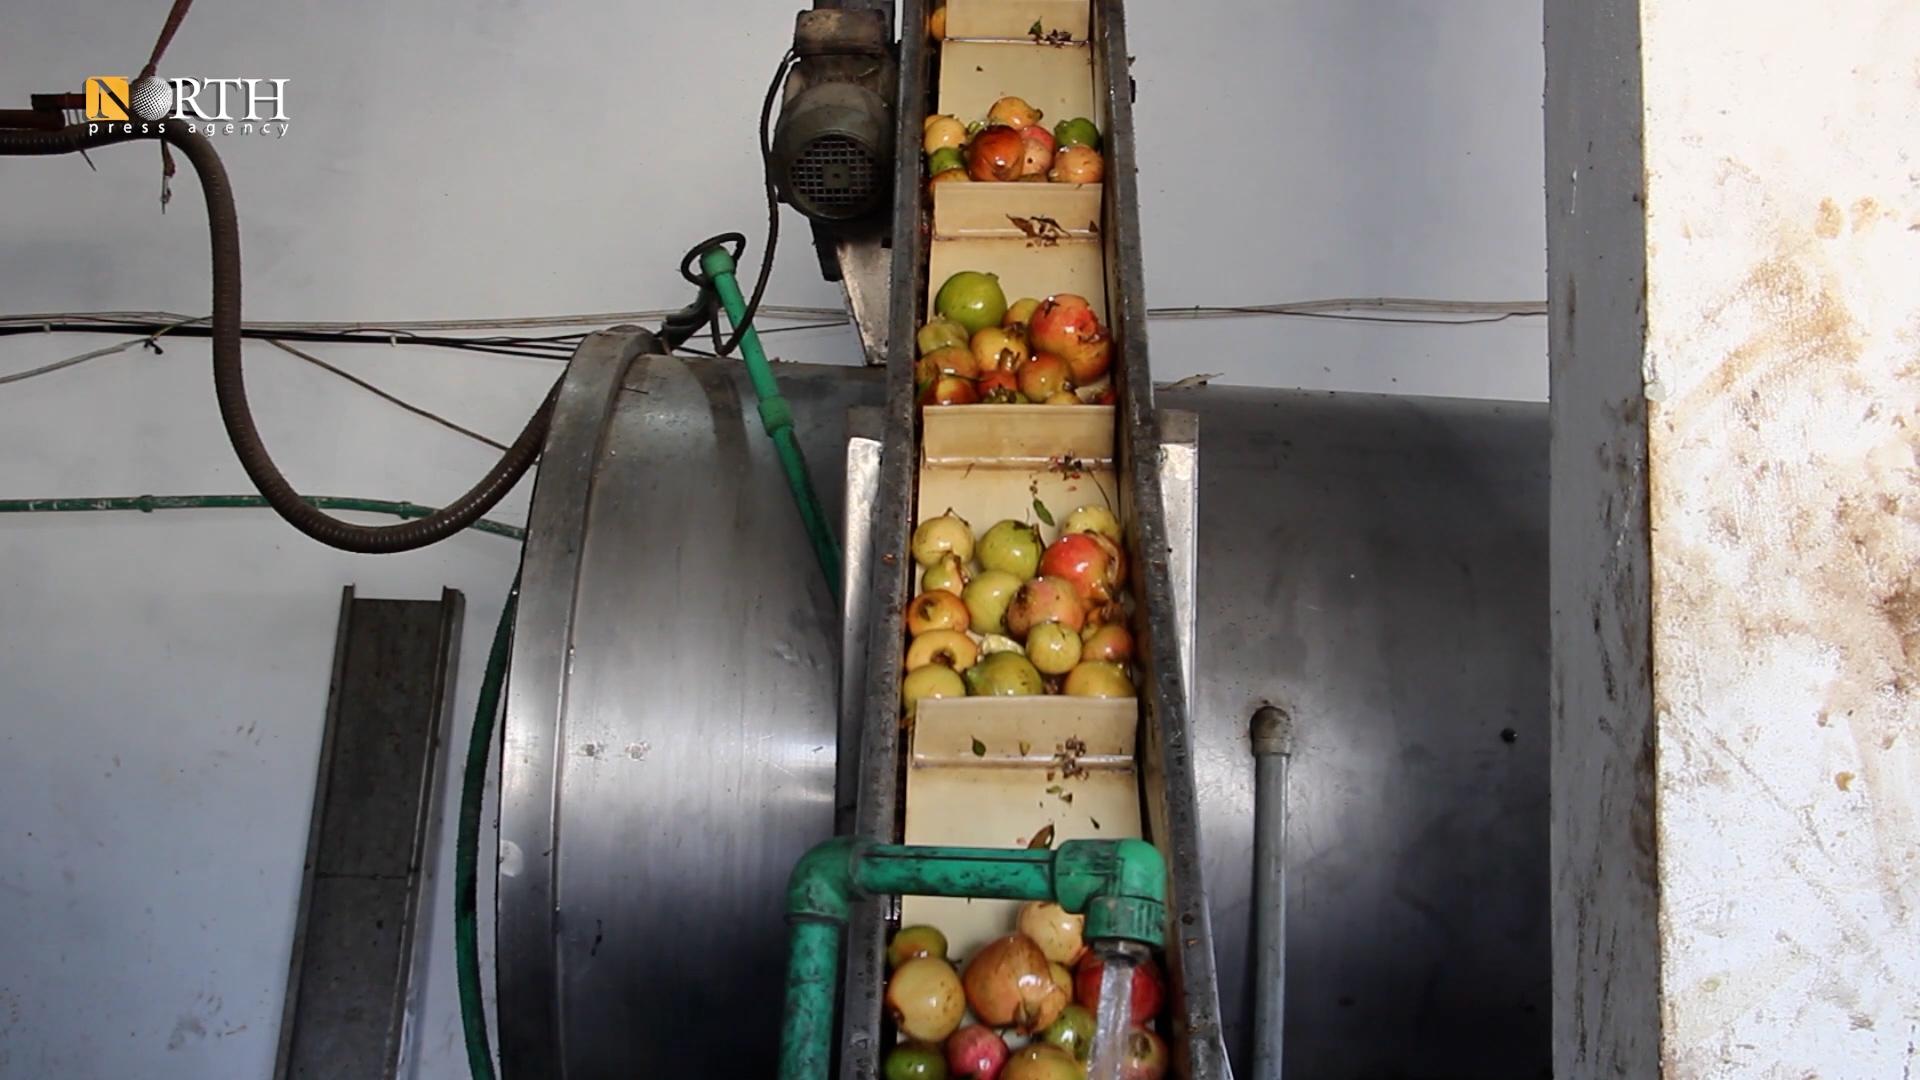 Pomegranate press in Manbij